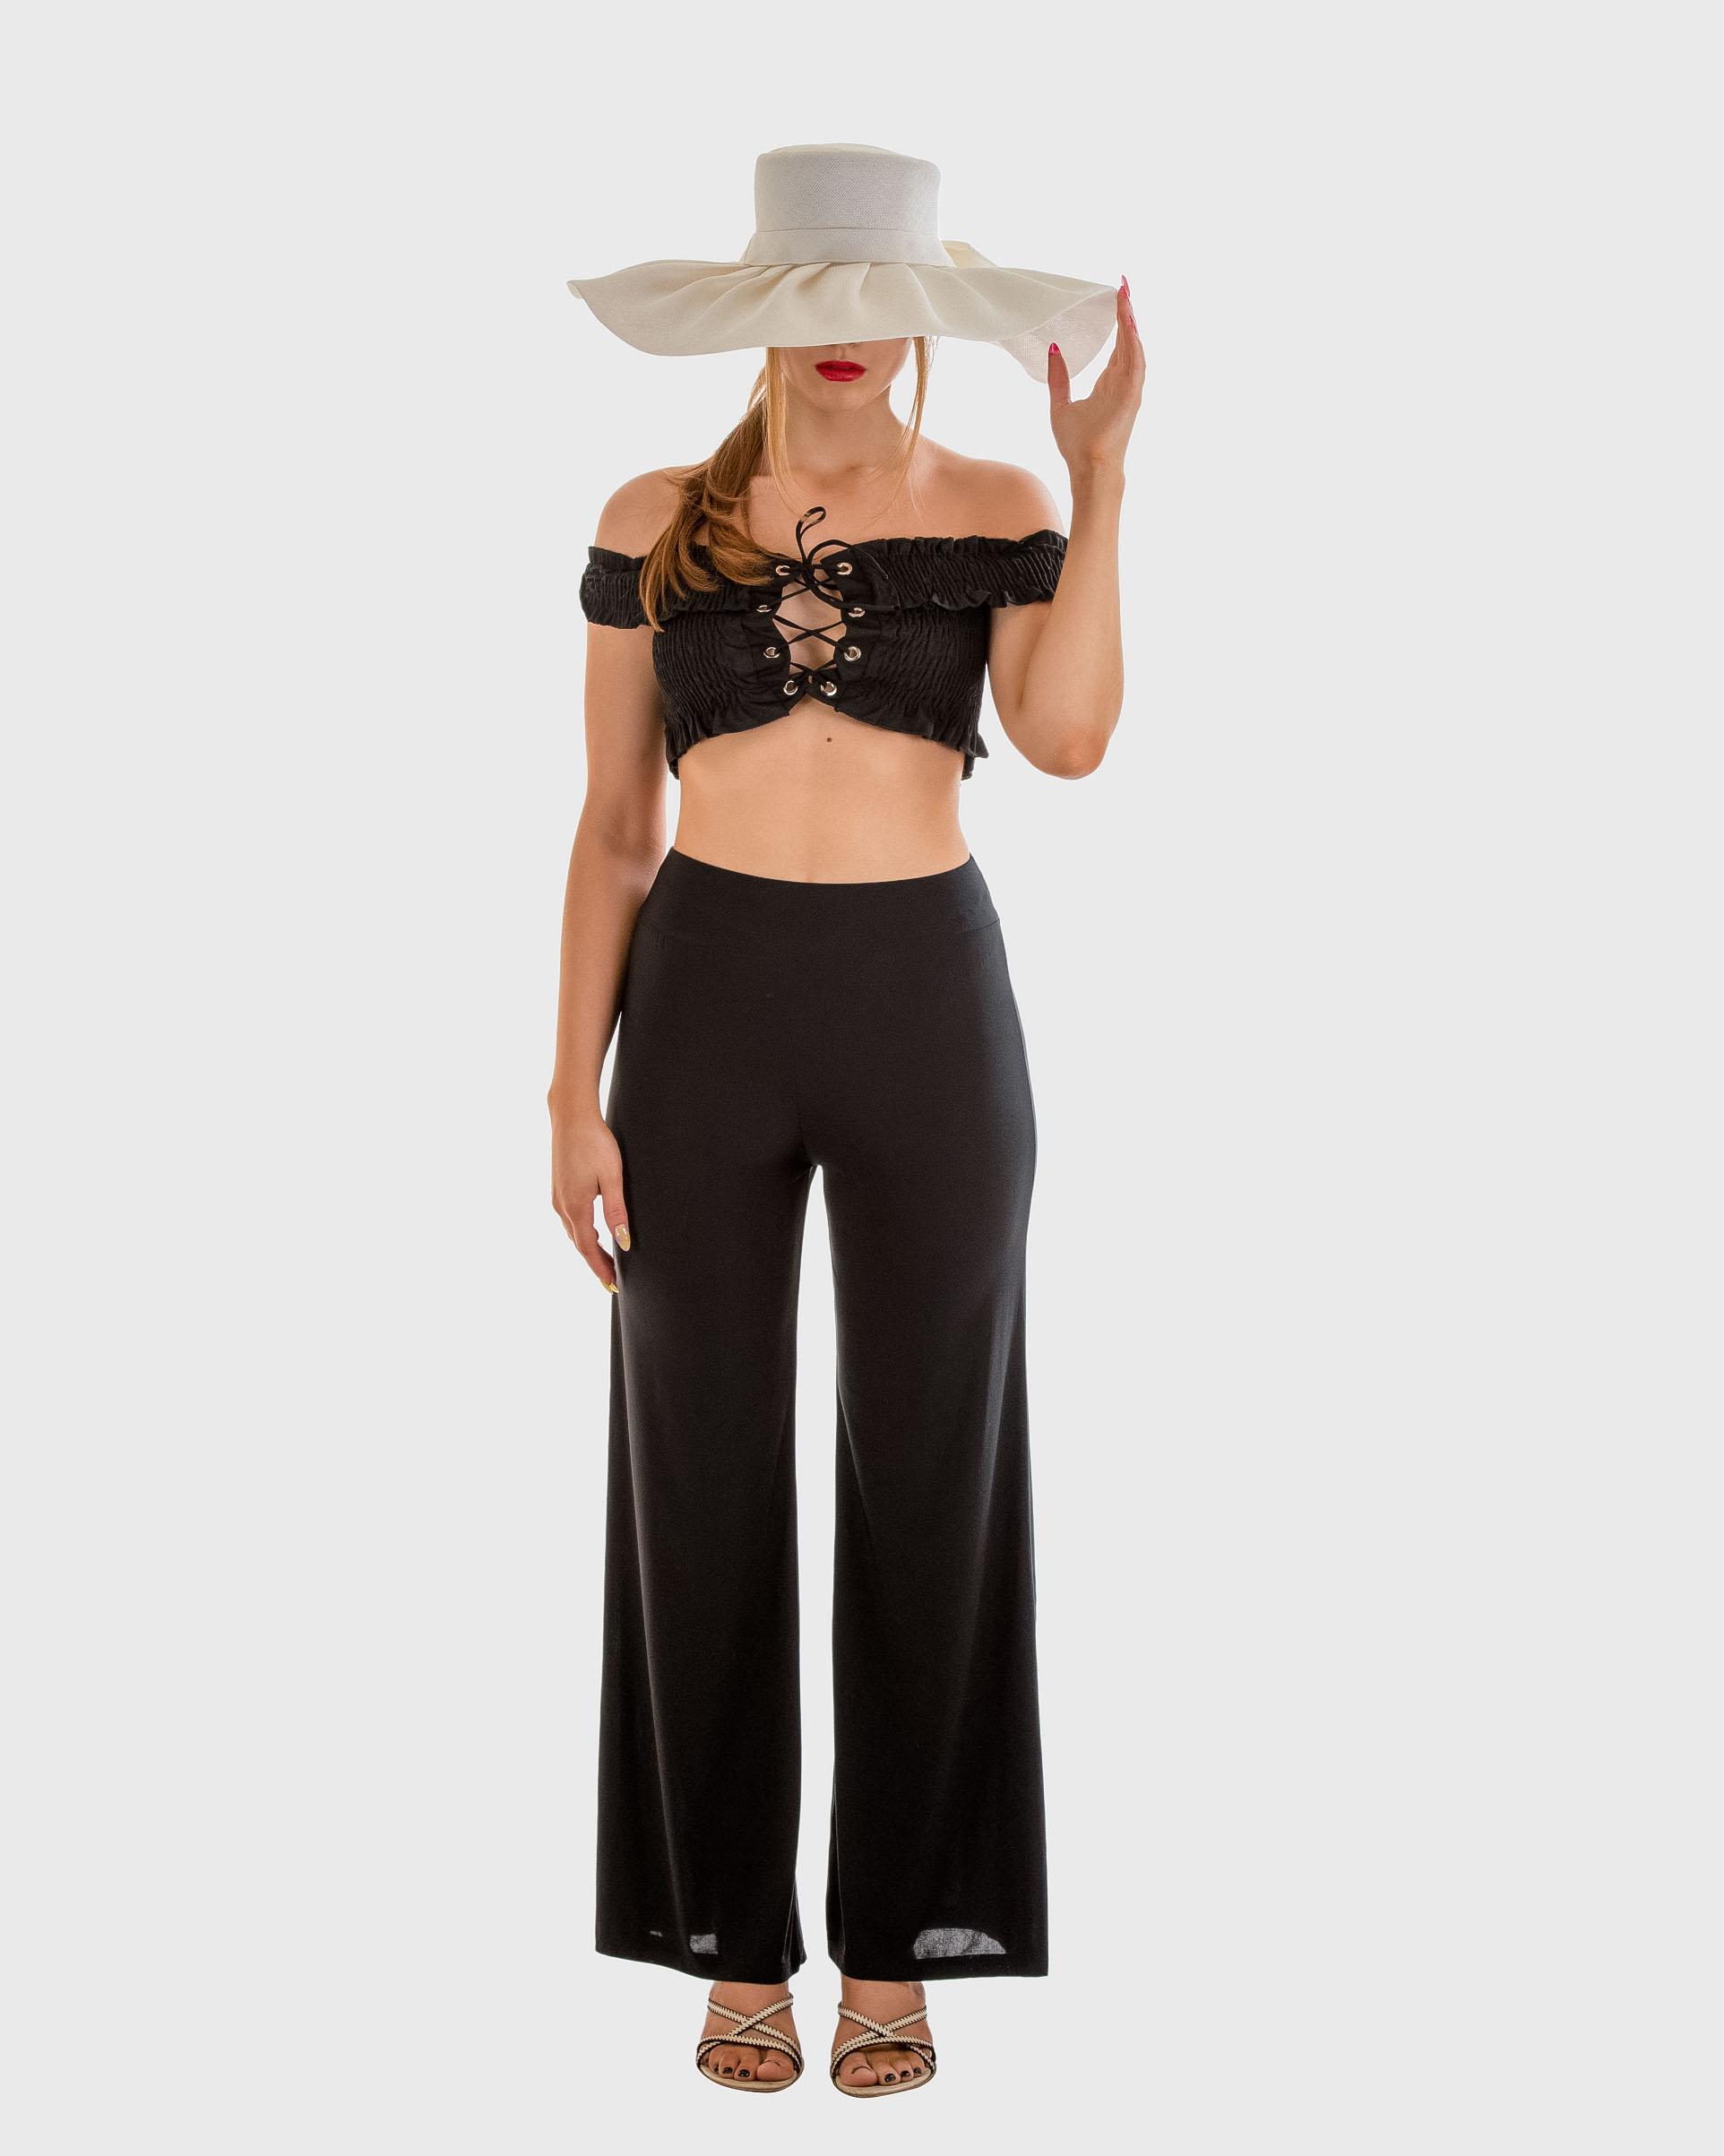 Clothes eshop product photography fashion ρουχα καταστημα φωτογραφιση nikolas polatos shop 016